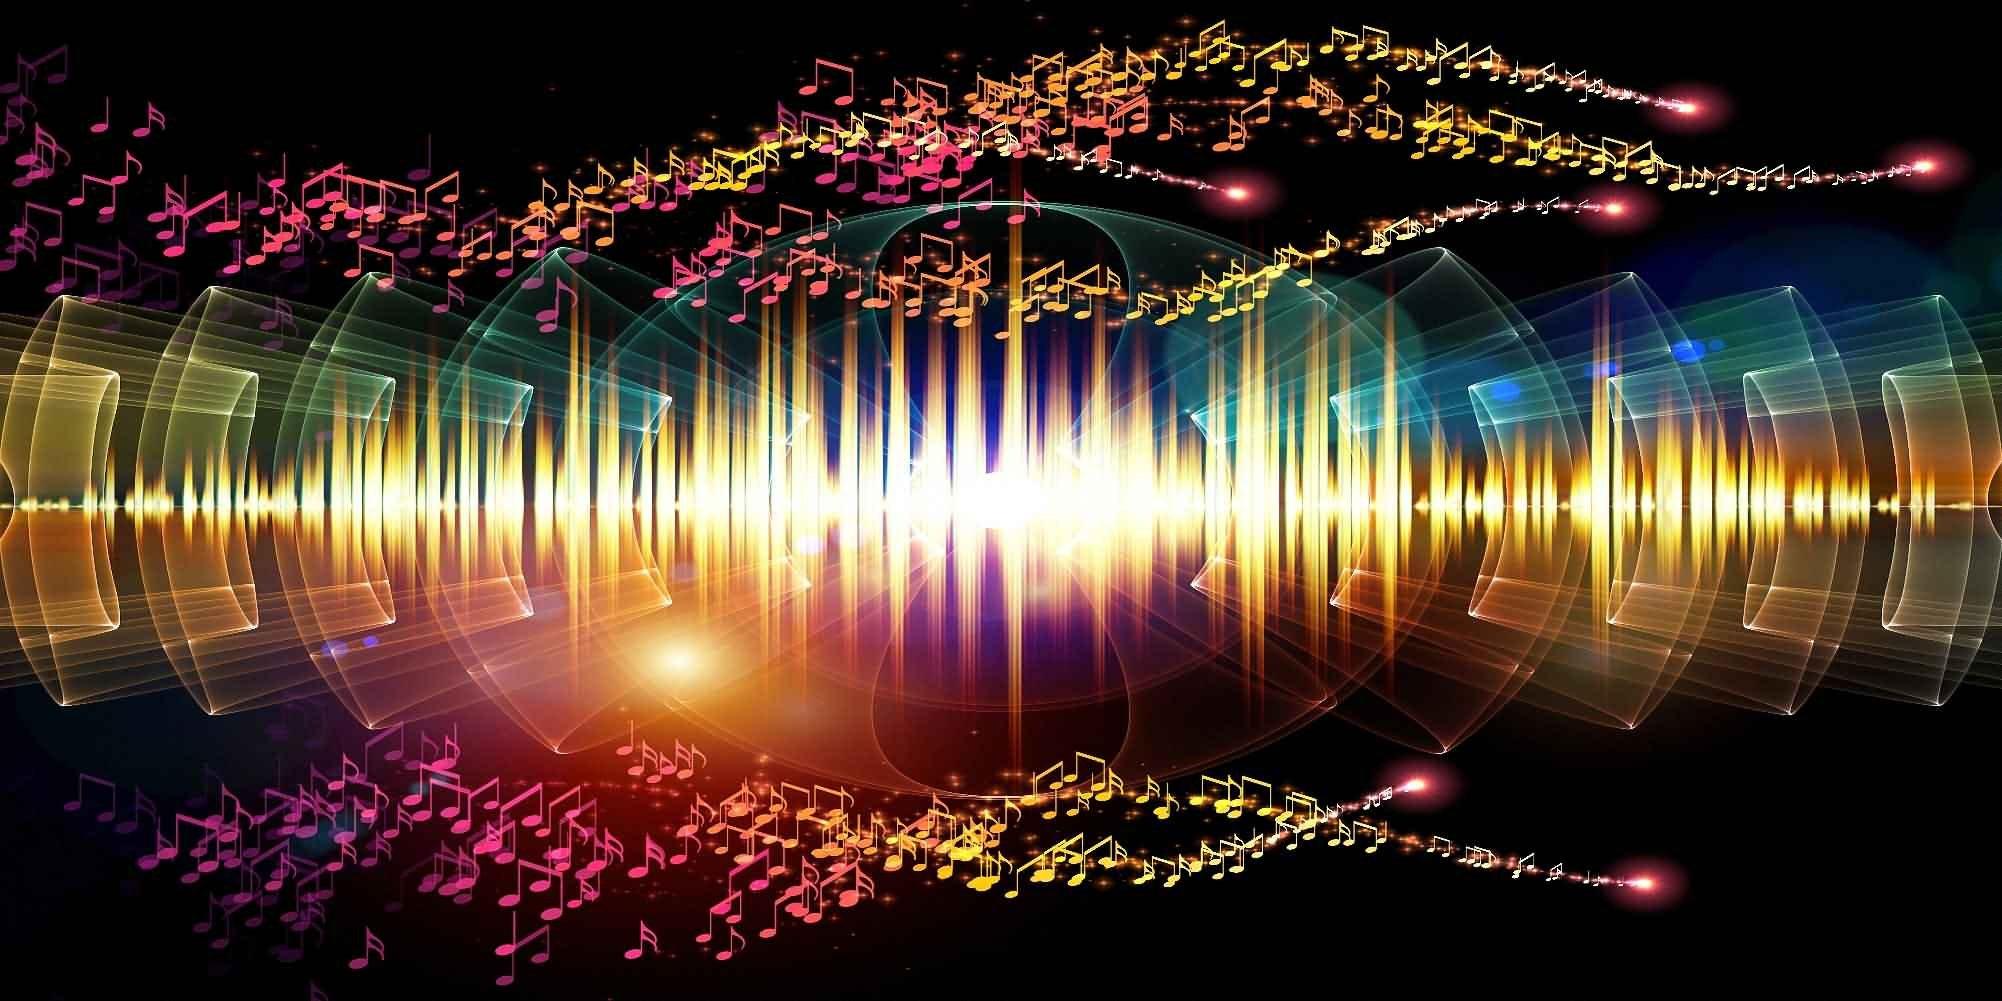 GladsBuy Elegent Melodies 20' x 10' Digital Printed Photography Backdrop Textures Theme Background YHA-032